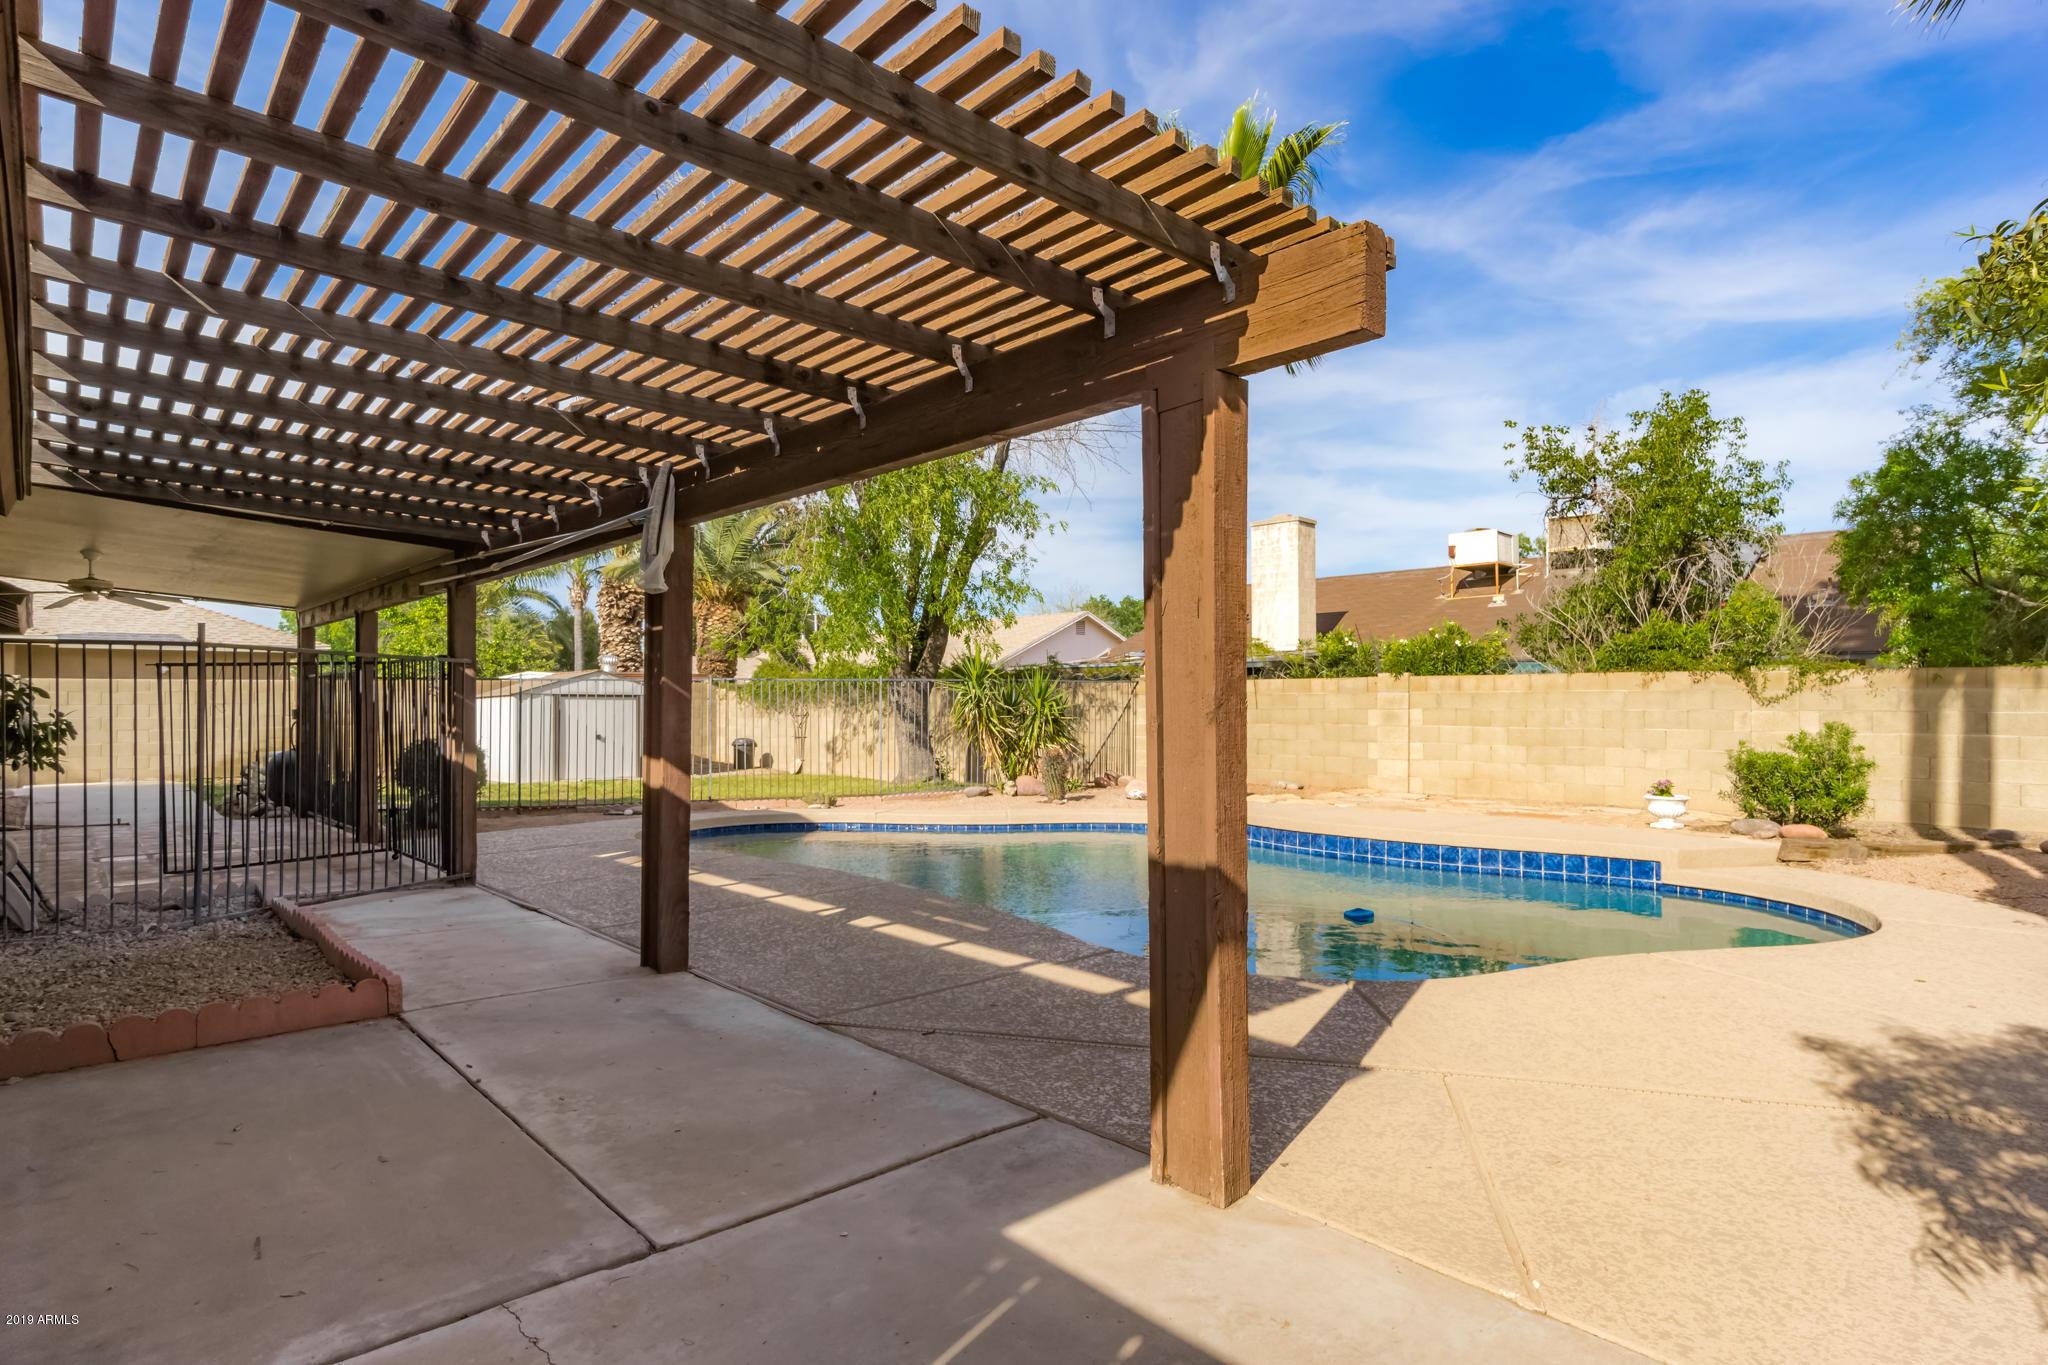 MLS 5907484 2525 S MOLLERA Circle, Mesa, AZ 85210